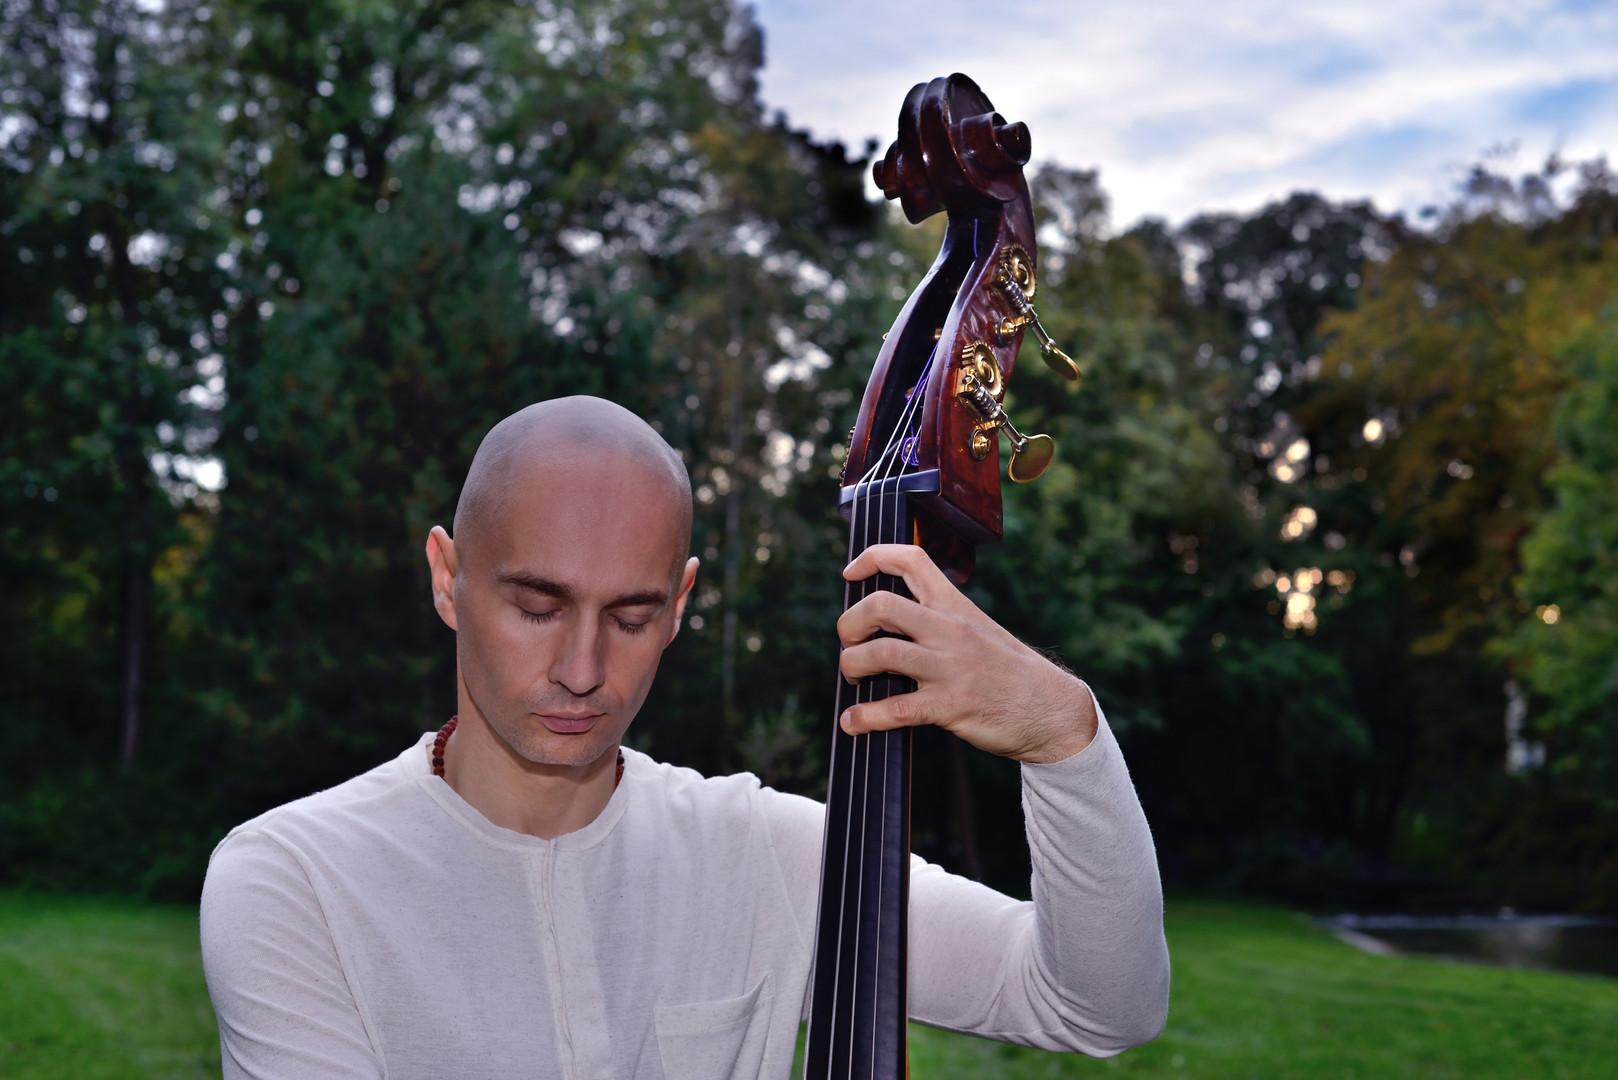 Peter Cudek